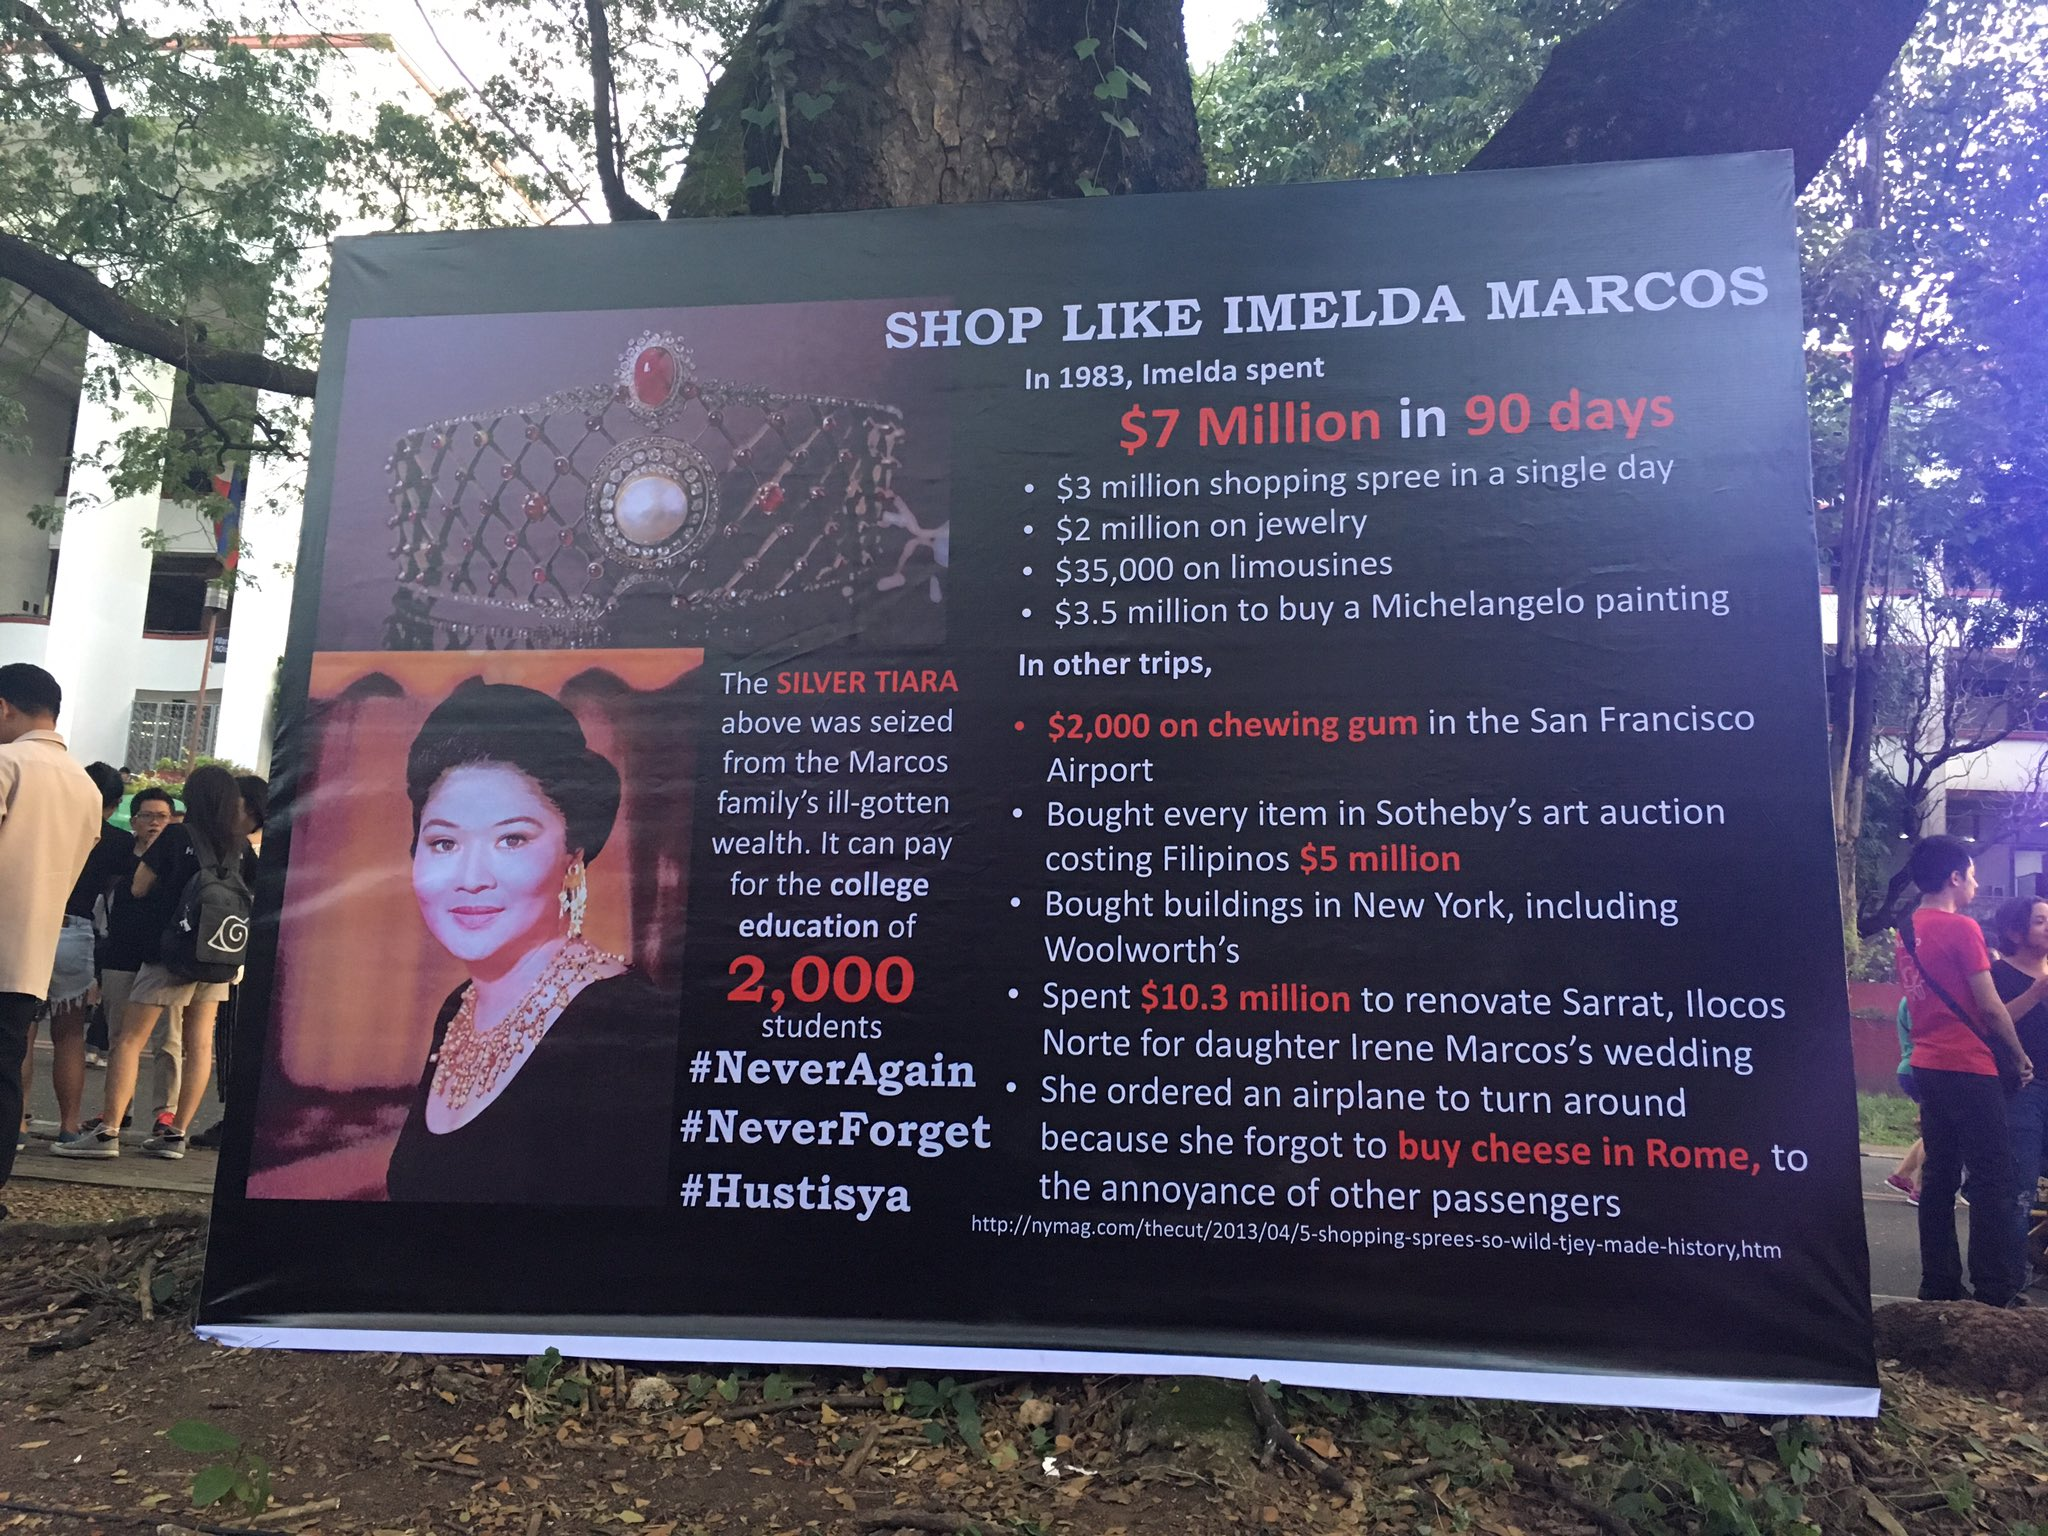 LOOK | How to shop like Imelda Marcos. #BeLEAN #NeverAgain https://t.co/UJlpUxXR6x